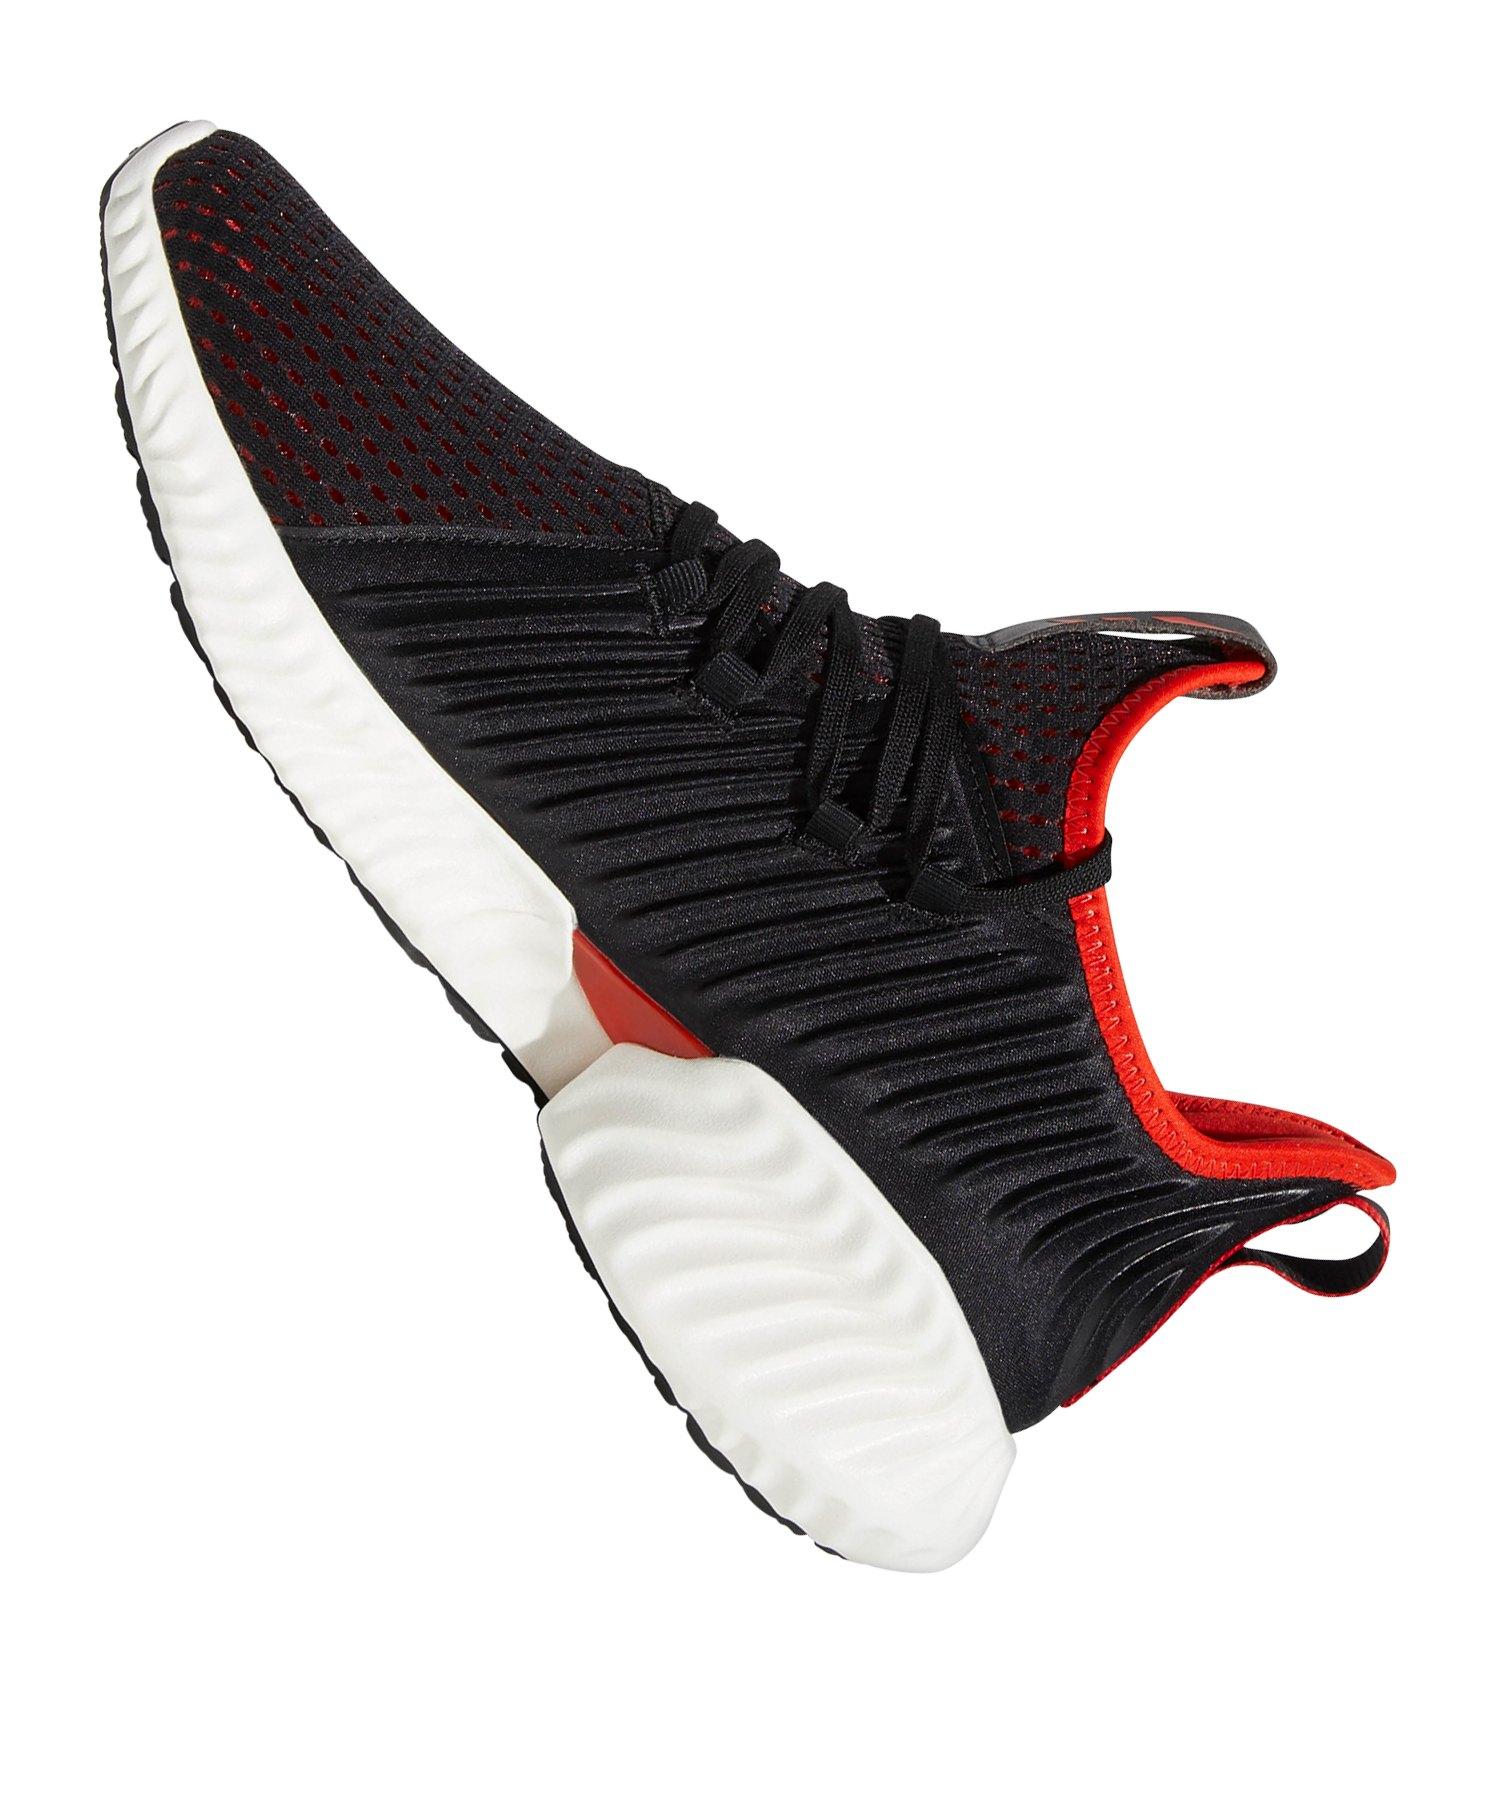 Instinct Running Adidas Schwarz Cc Alphabounce txQrshdC